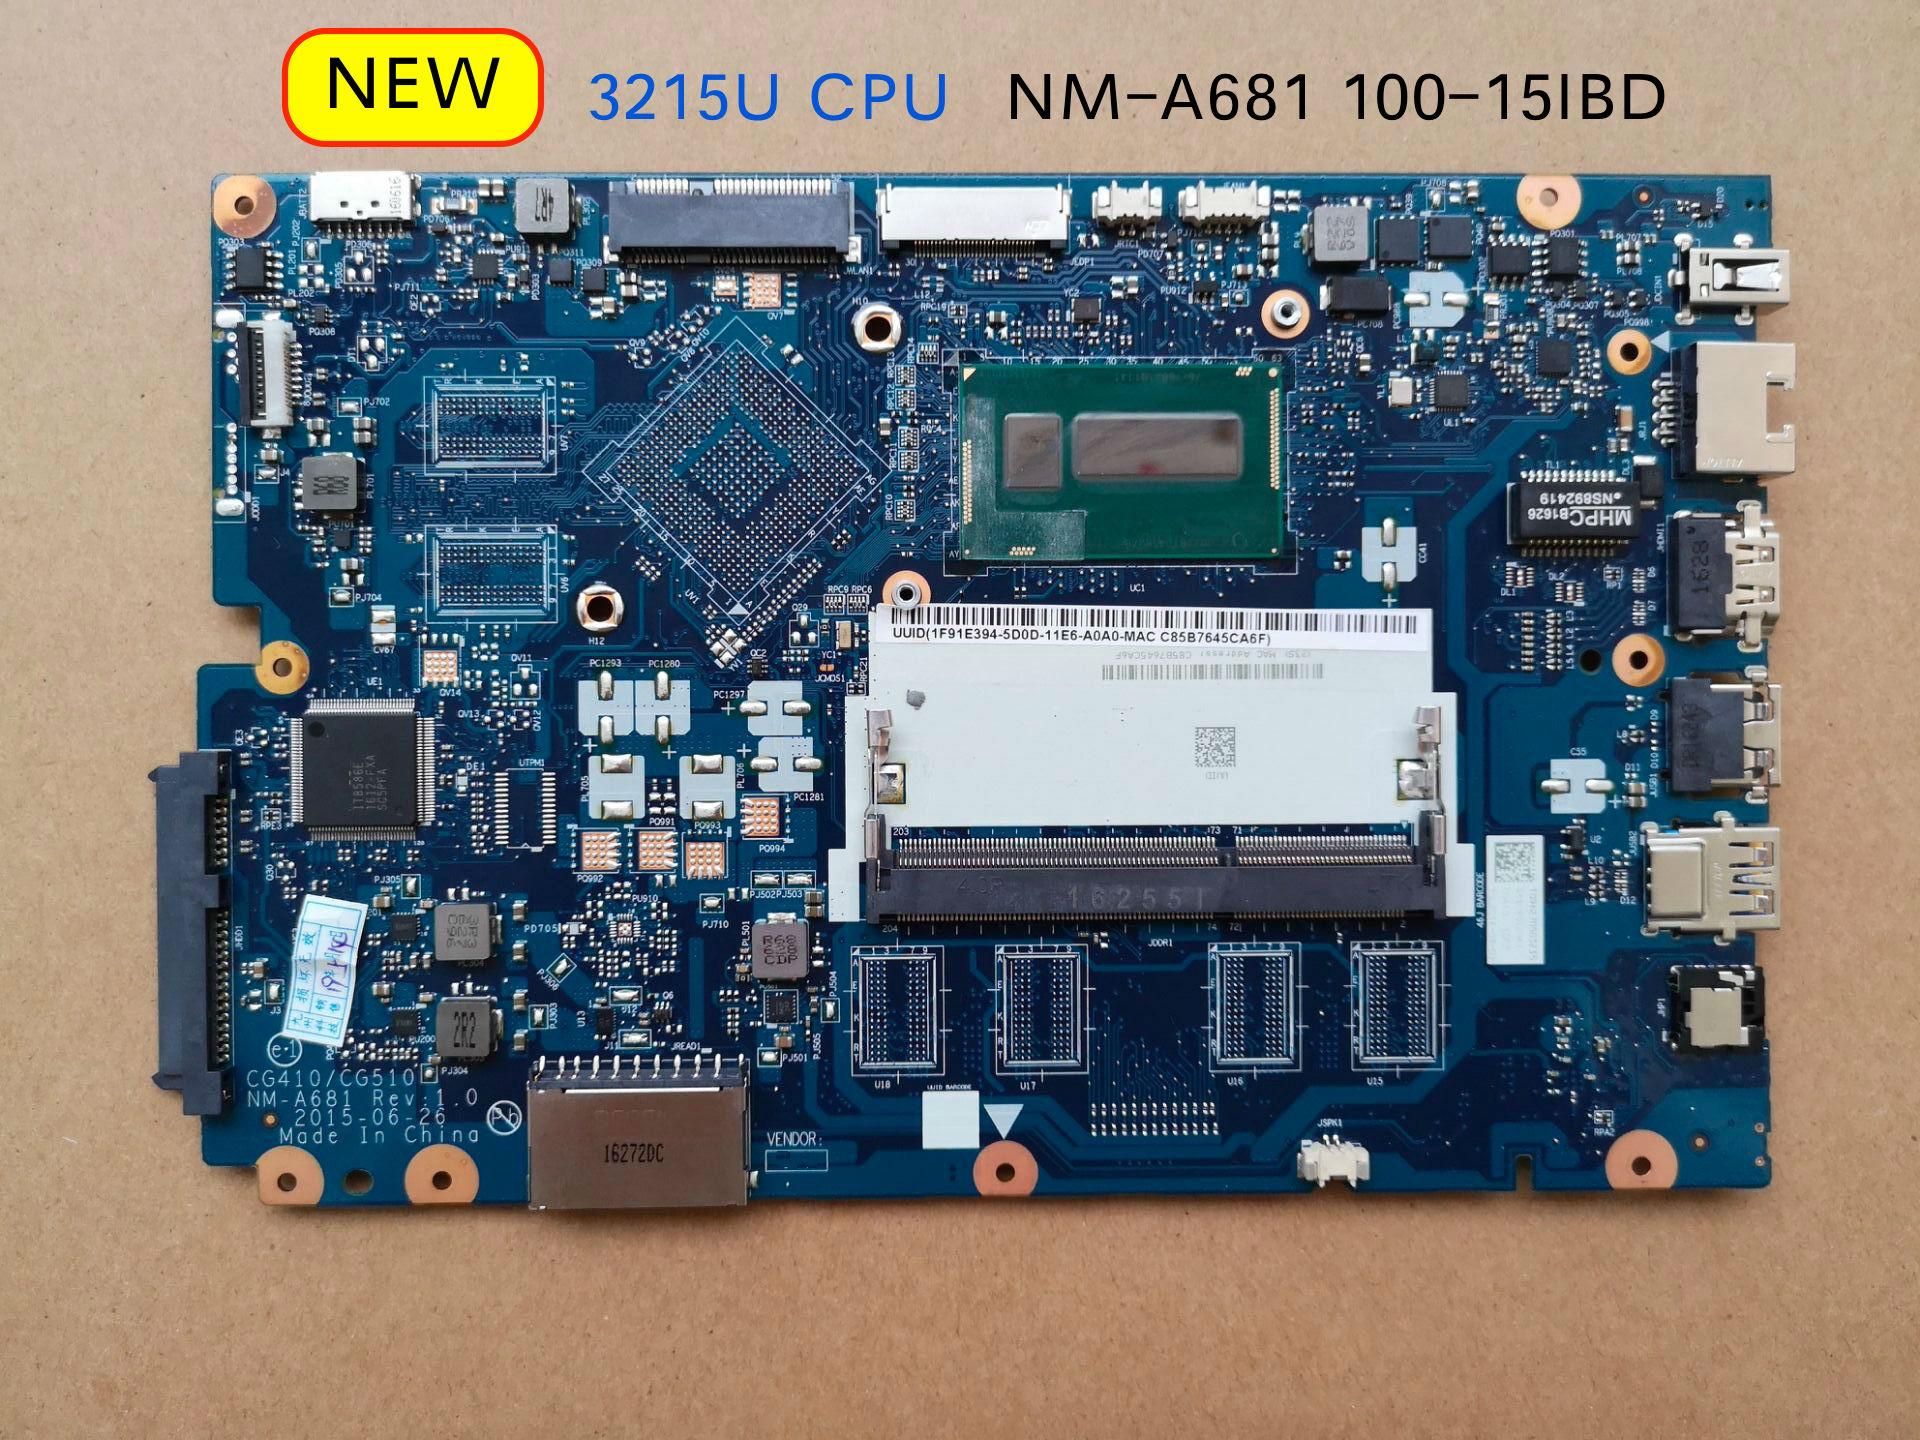 Tested Original CG410 CG510 NM-A681 Mainboard For Lenovo Ideapad 100-15IBD 100 15IBD Laptop Motherboard 3215U CPU